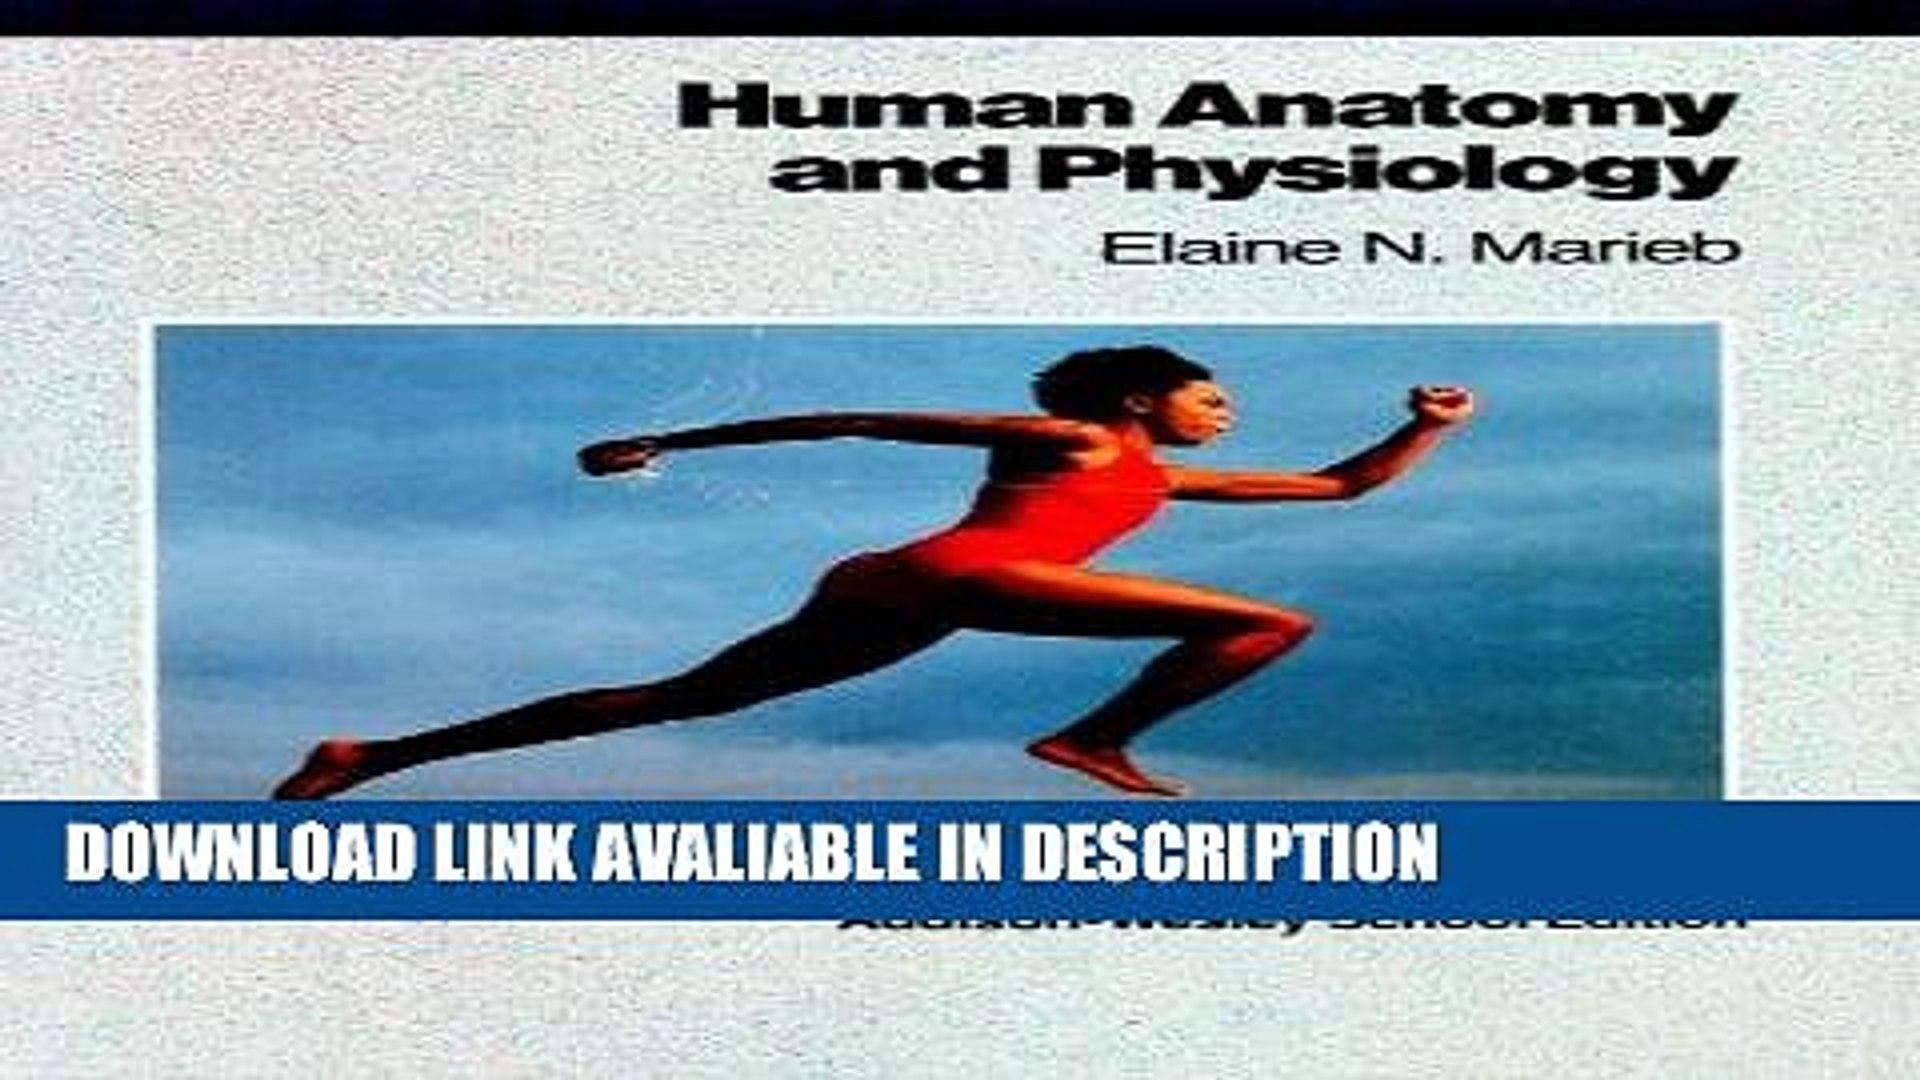 essentials of human anatomy and physiology 10th edition elaine marieb pdf free